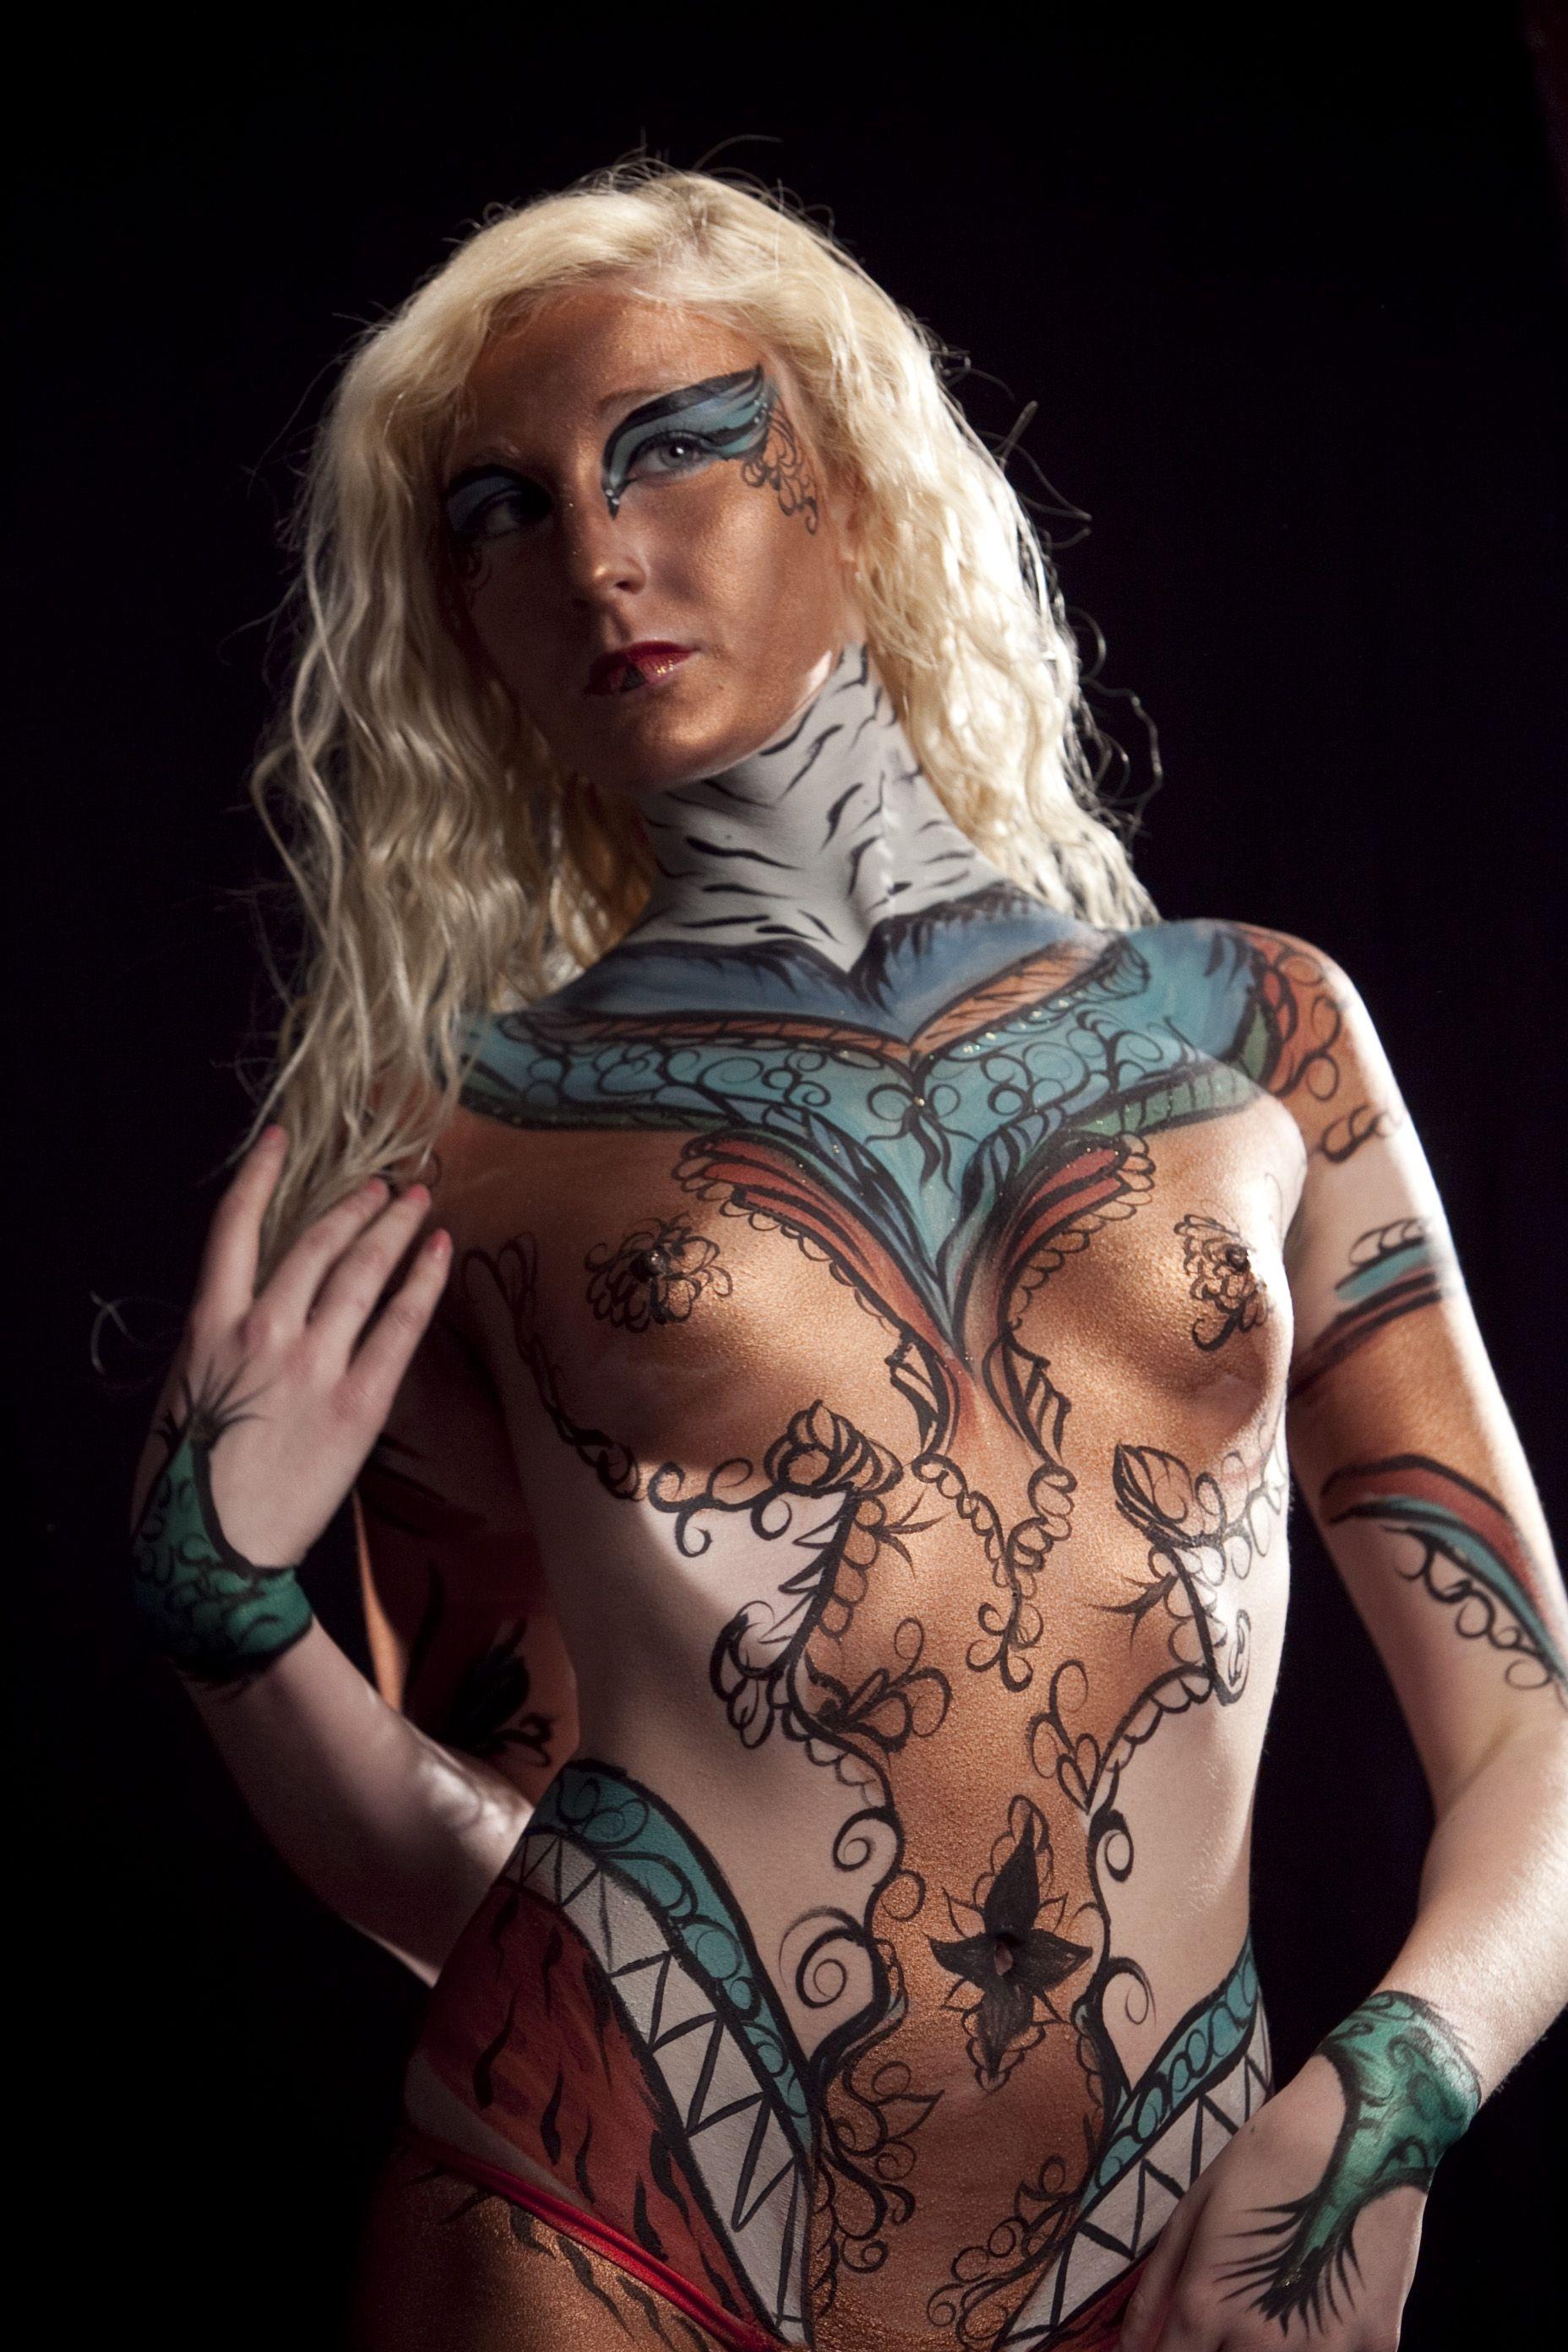 Body Paint by Philadelphia Body Painter Jennifer Montgomery